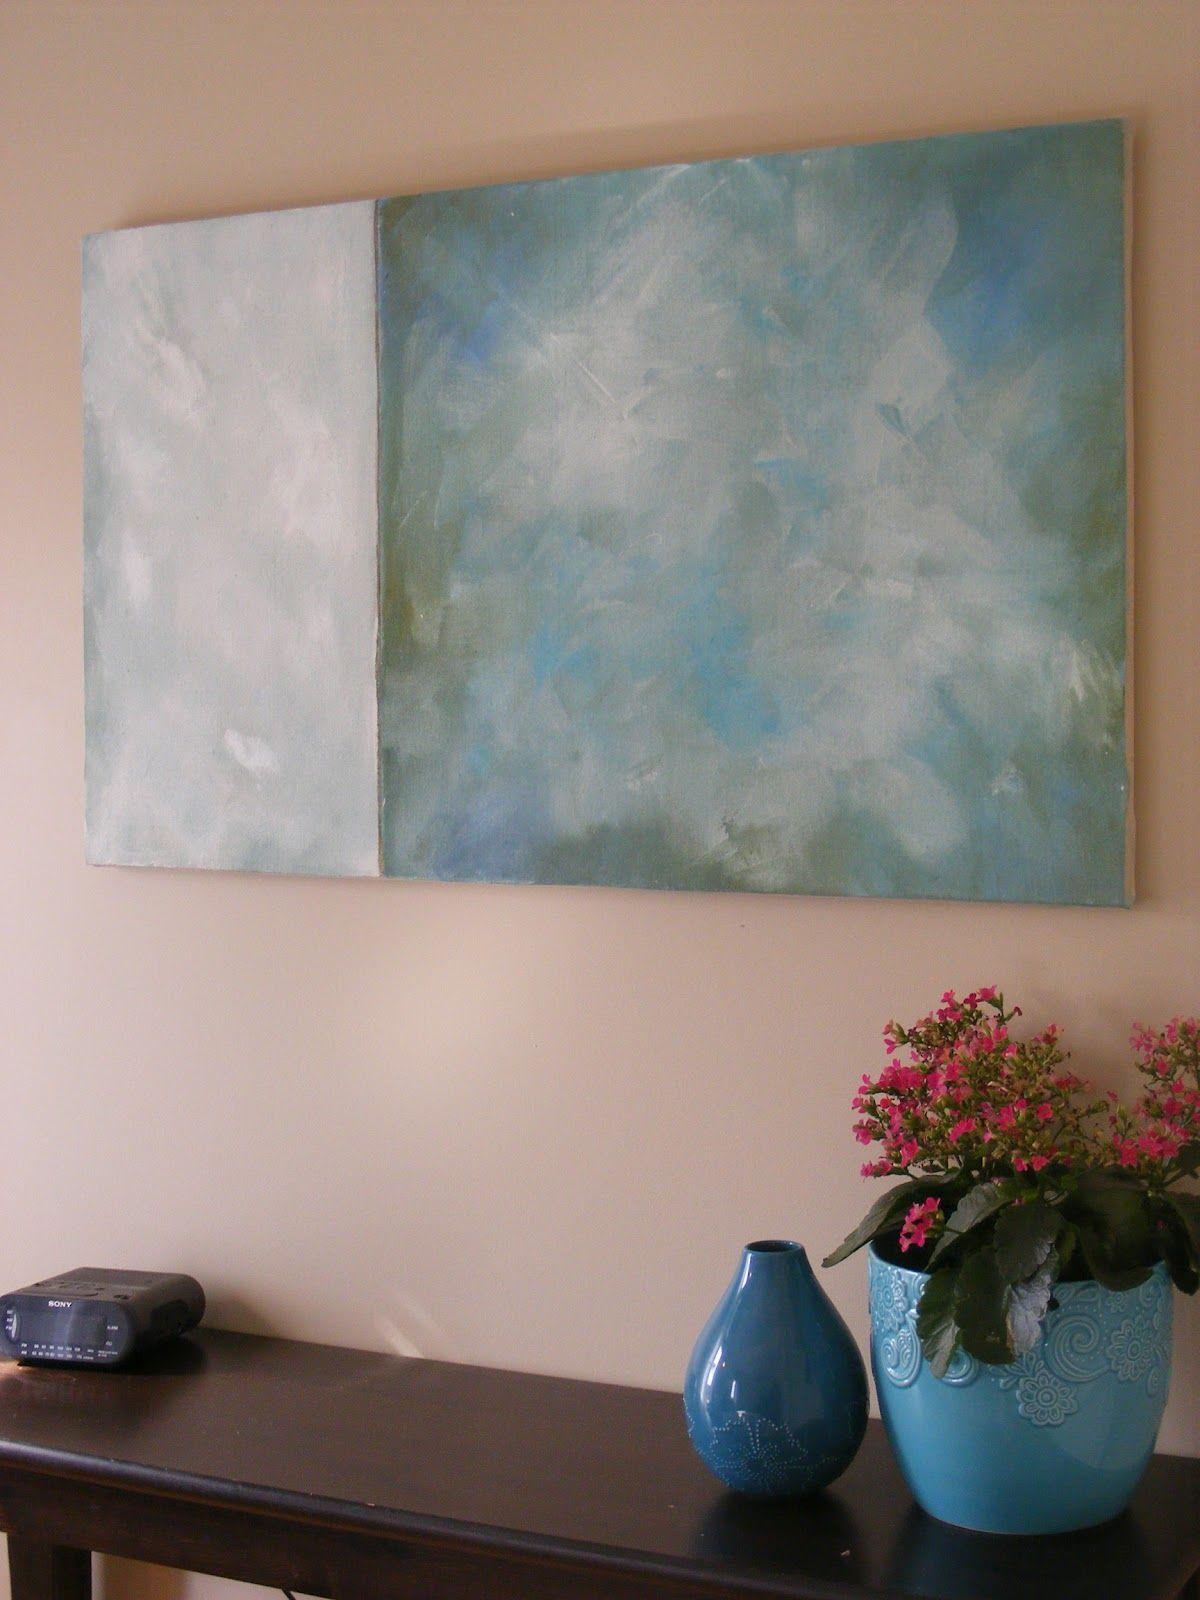 Simple, Thrifty DIY Art Diy artwork, Diy art, Diy wall art